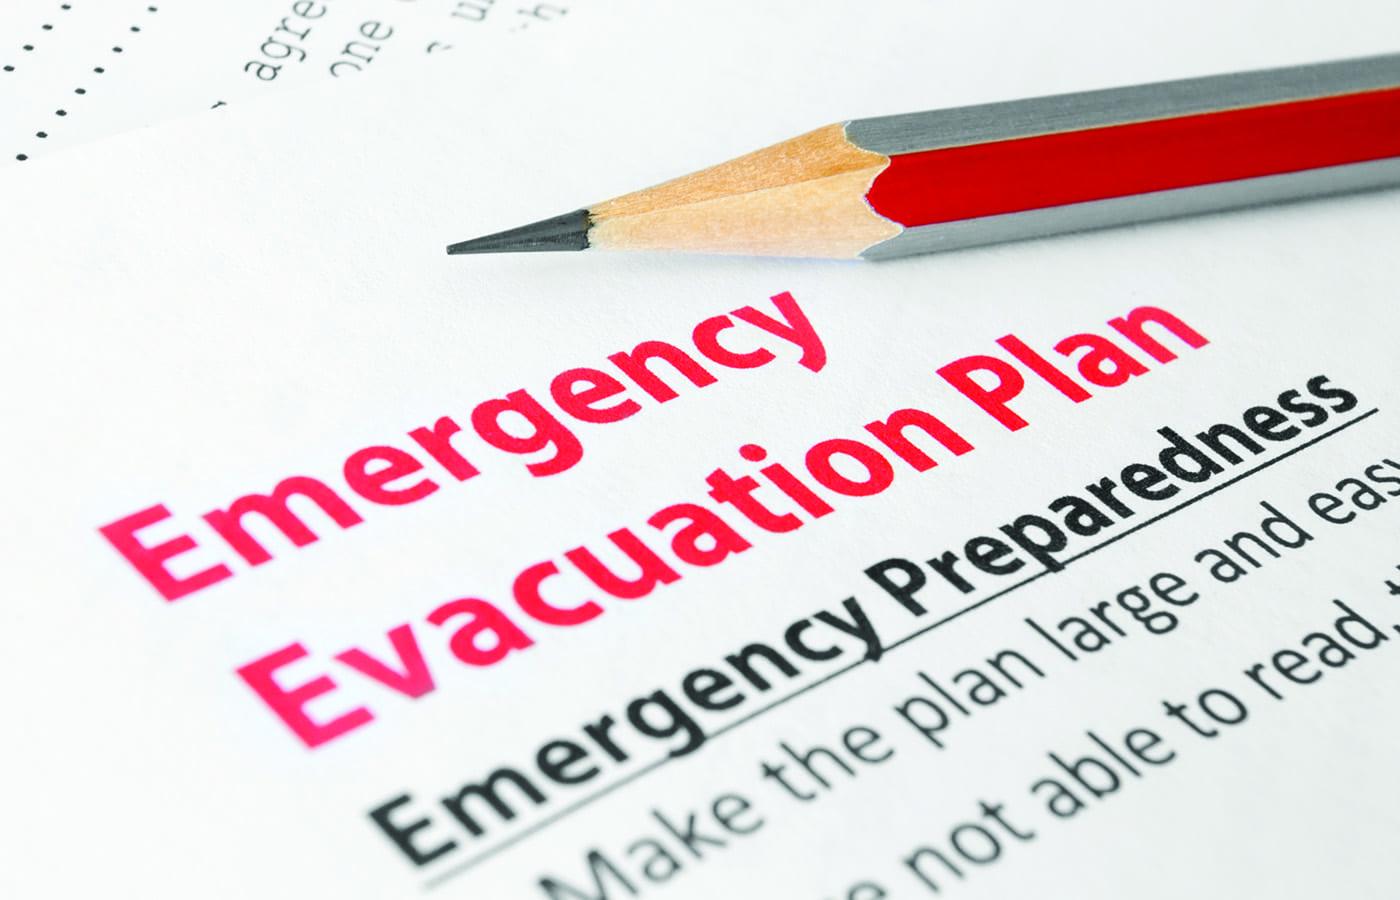 evacuation chair training checklist